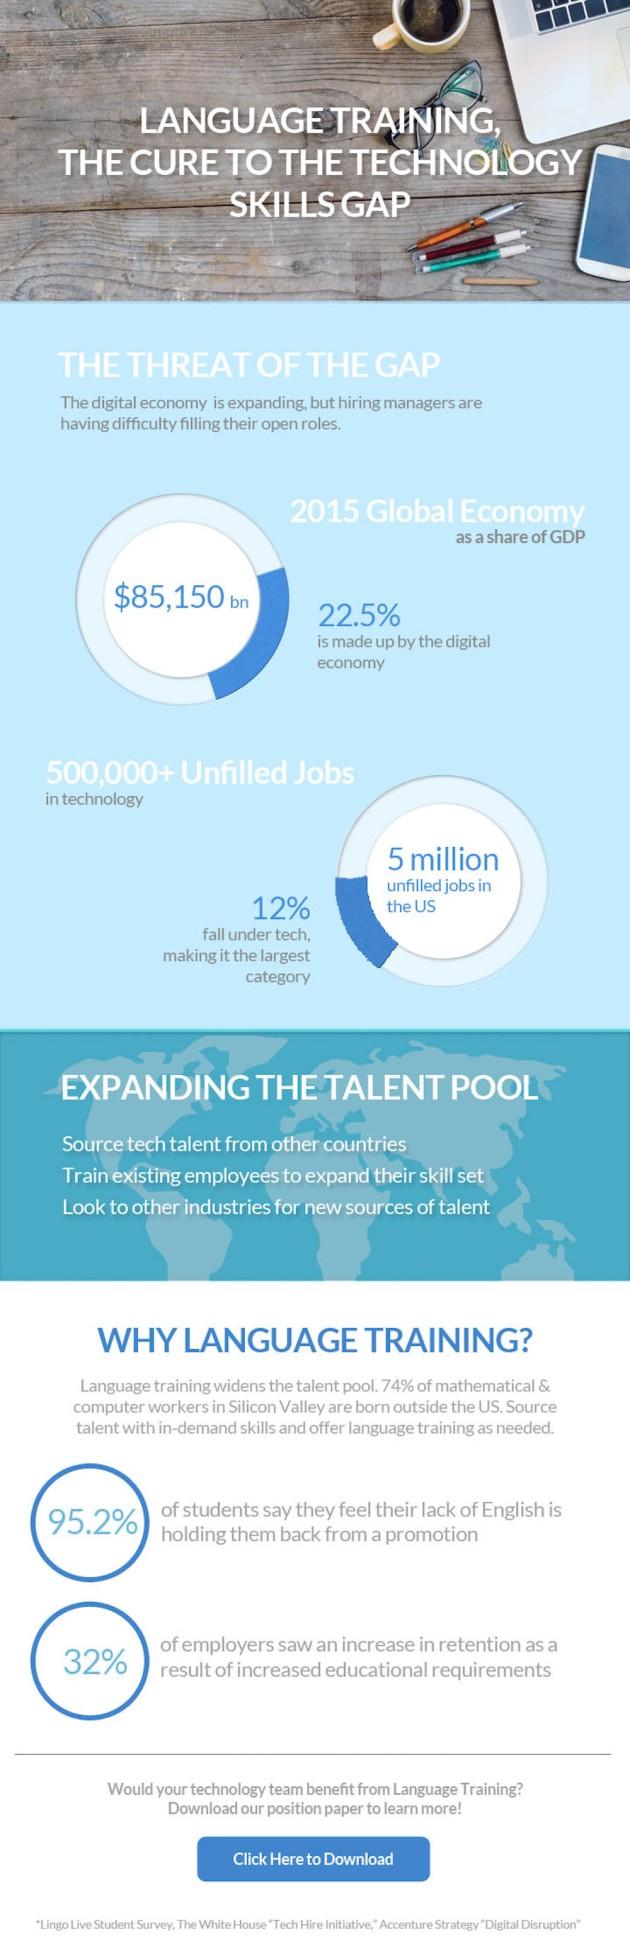 Skills gap infographic